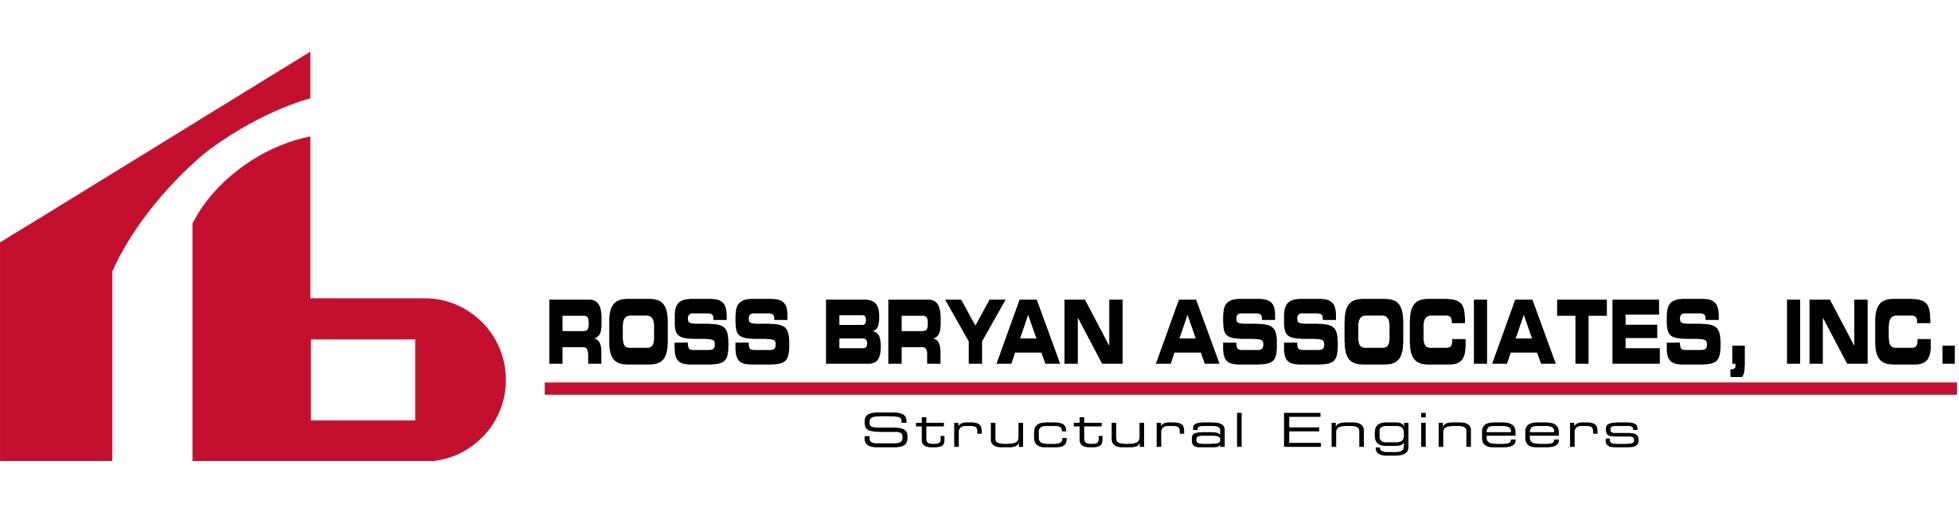 Ross Bryan